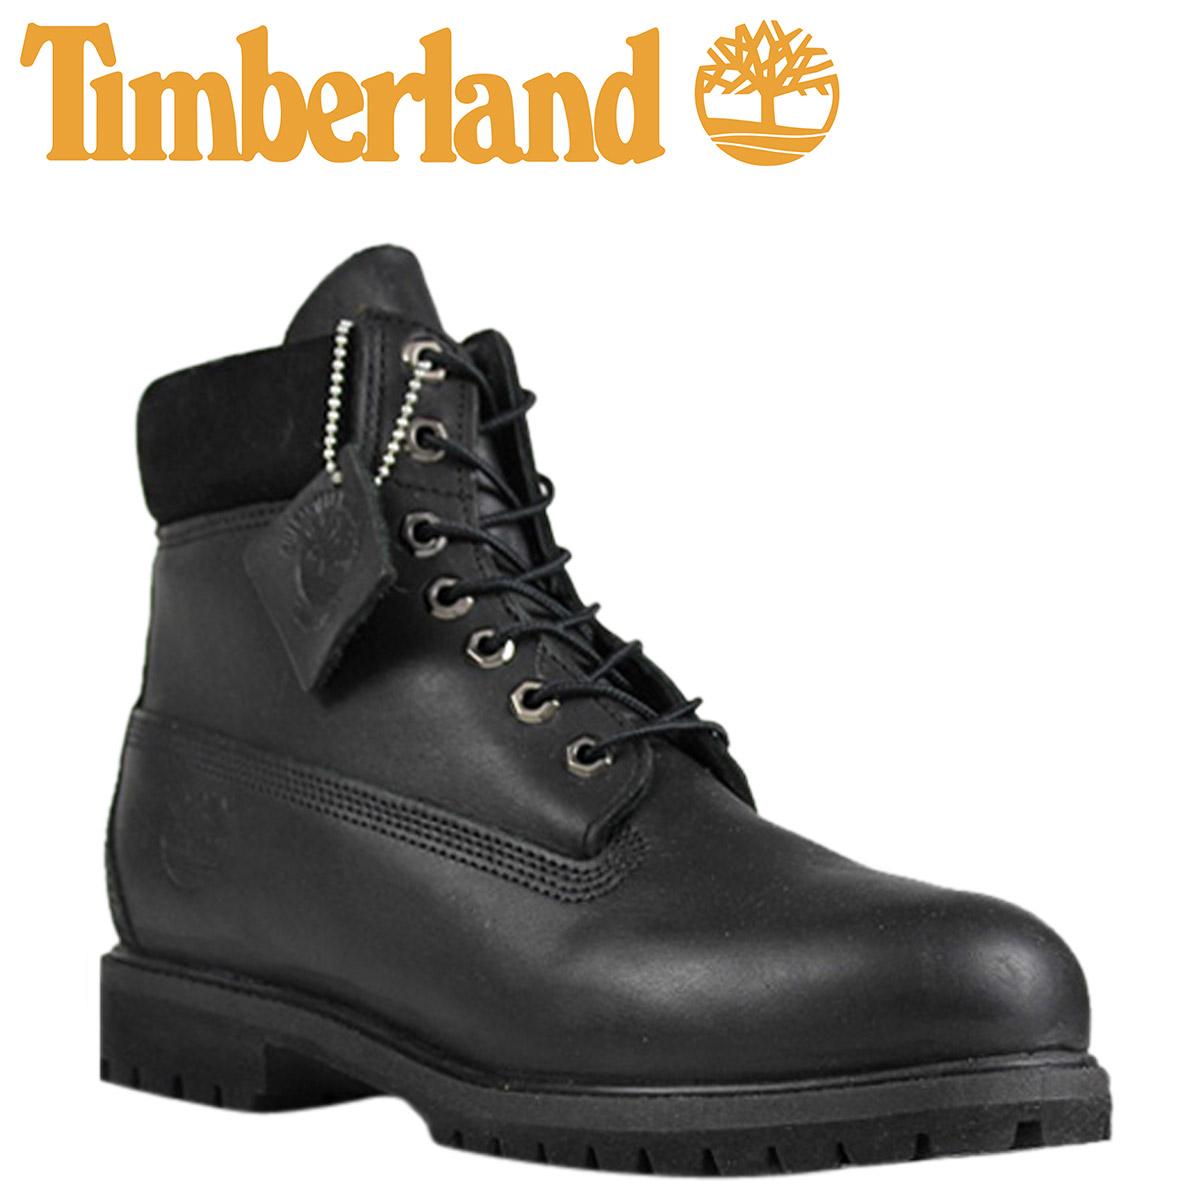 Stivali Impermeabili Timberland Premium 6 Pollici Per Gli Uomini UD3J0xgru